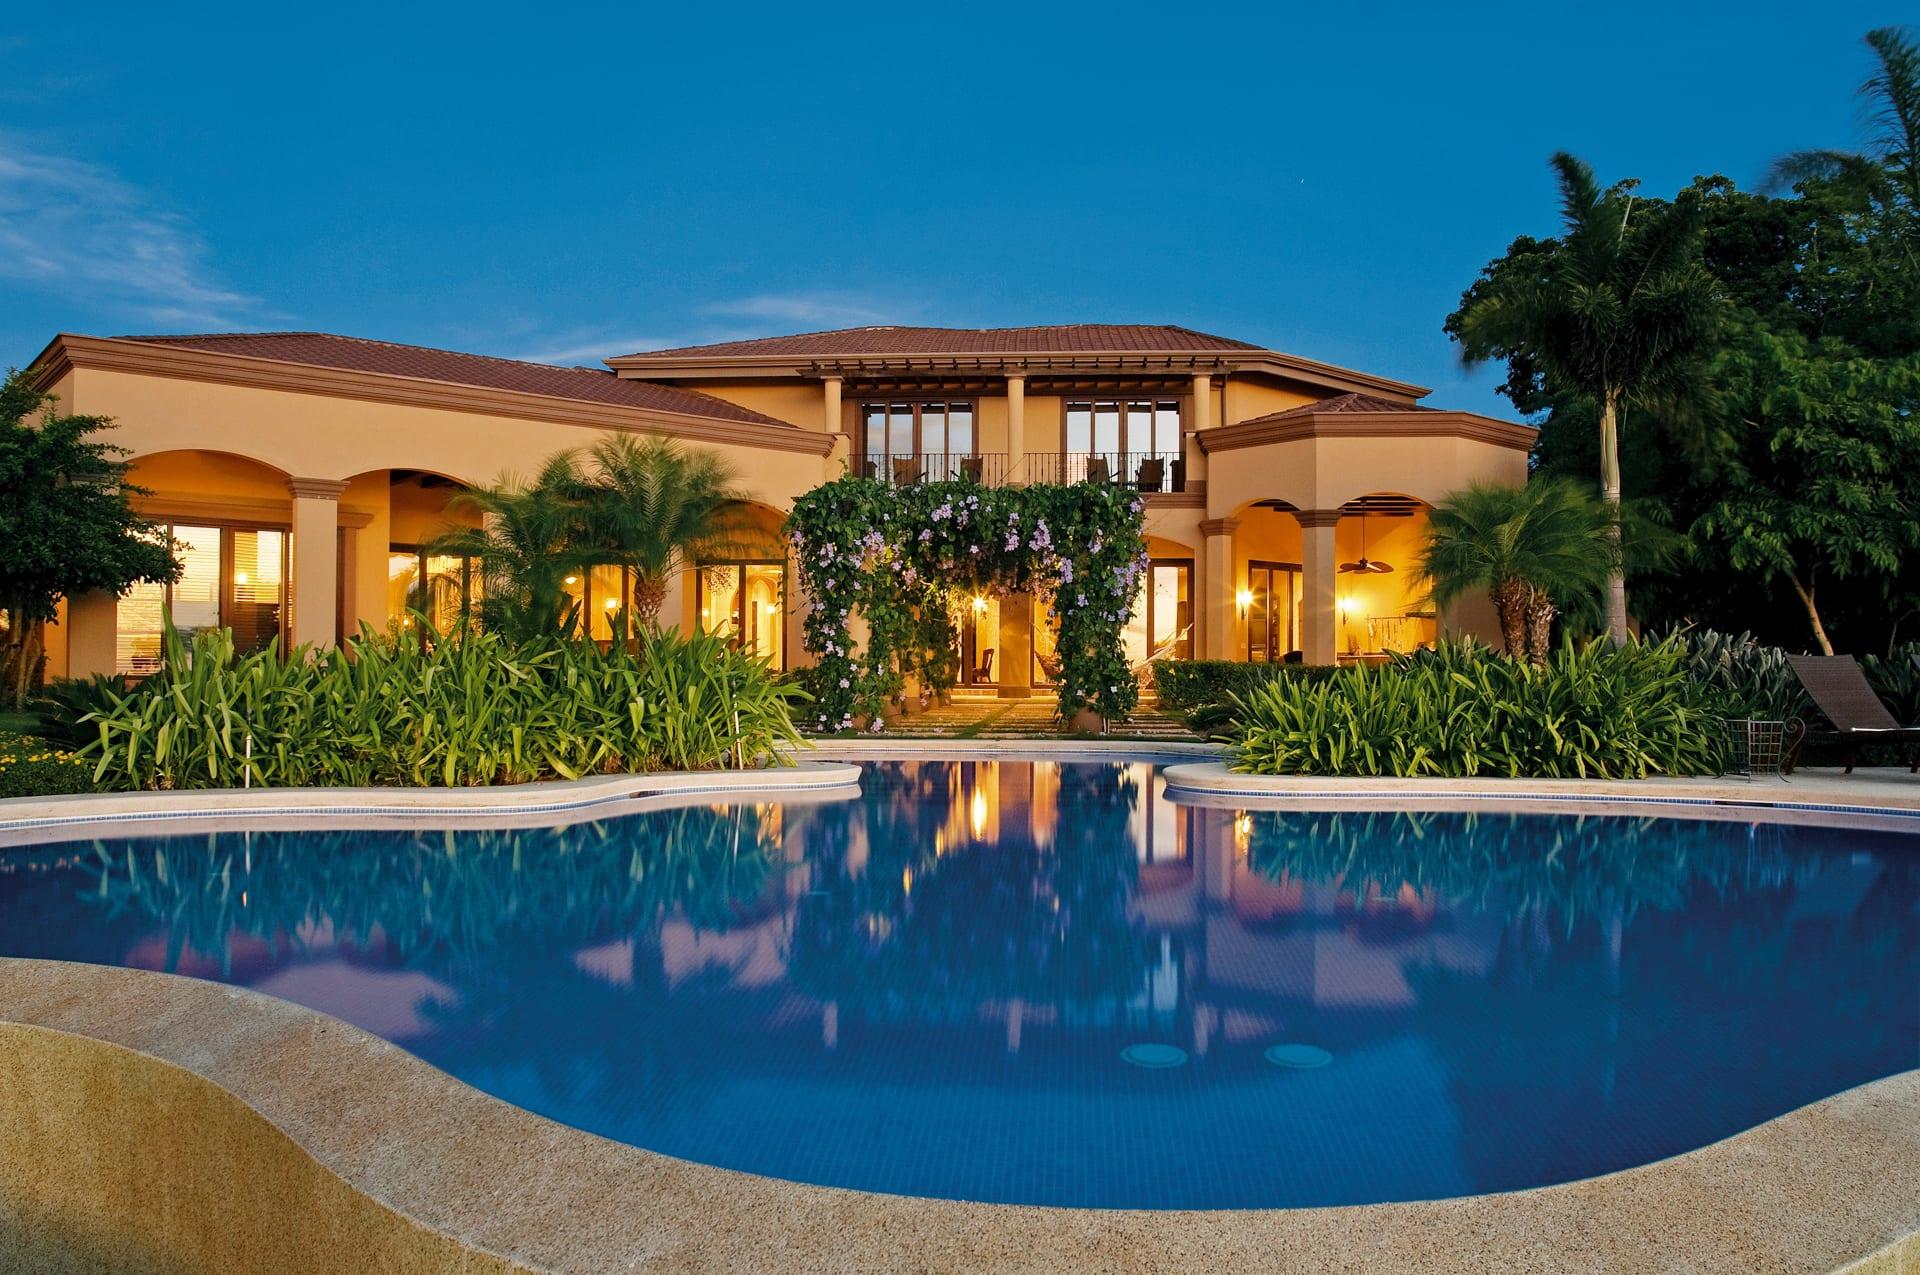 Villa Puesta de Sol Luxury Home_Sarco Architects Costa Rica-1